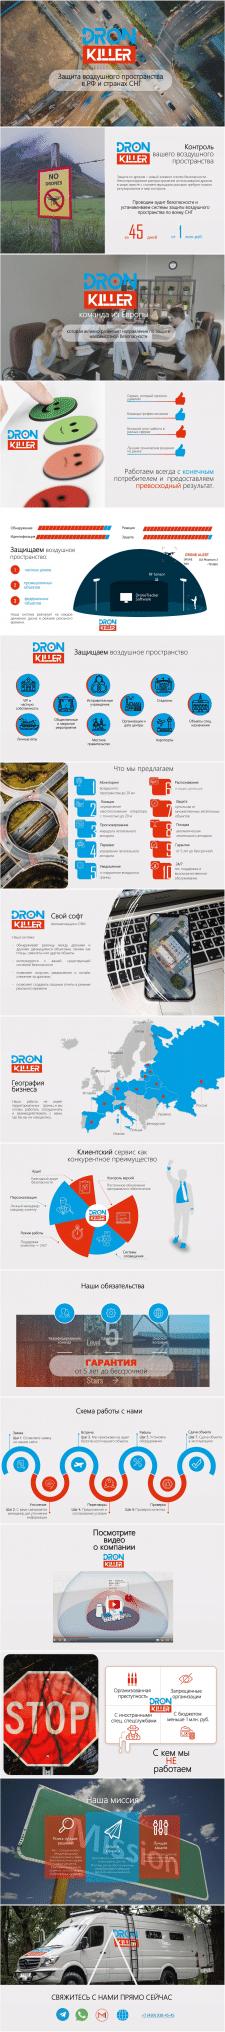 Разработка презентации (DronKiller)